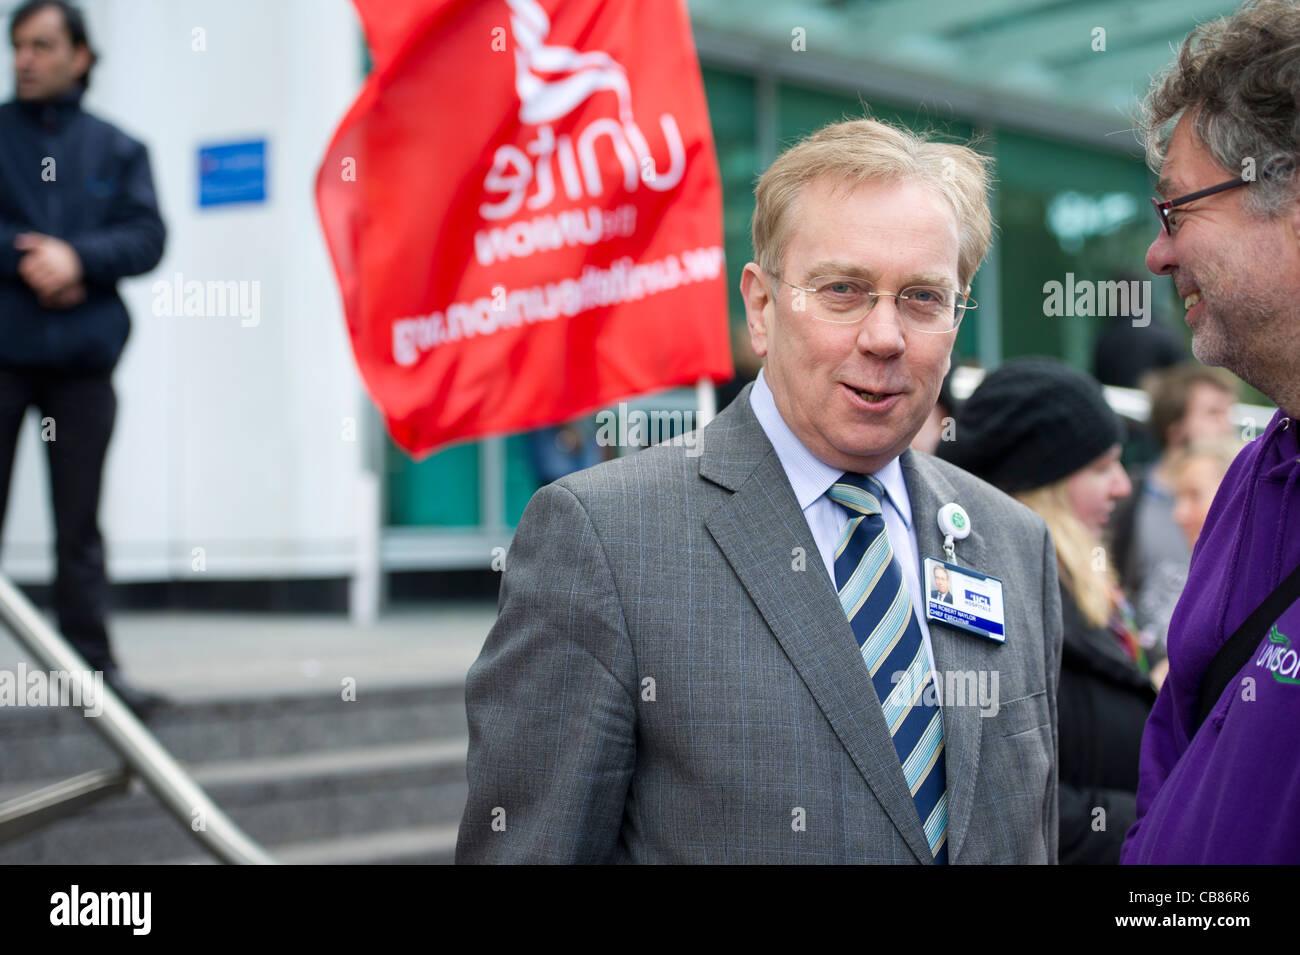 Sir Robert Naylor, Chief Executive des University College London Hospital außerhalb UCH bei Euston am Tag des Stockbild